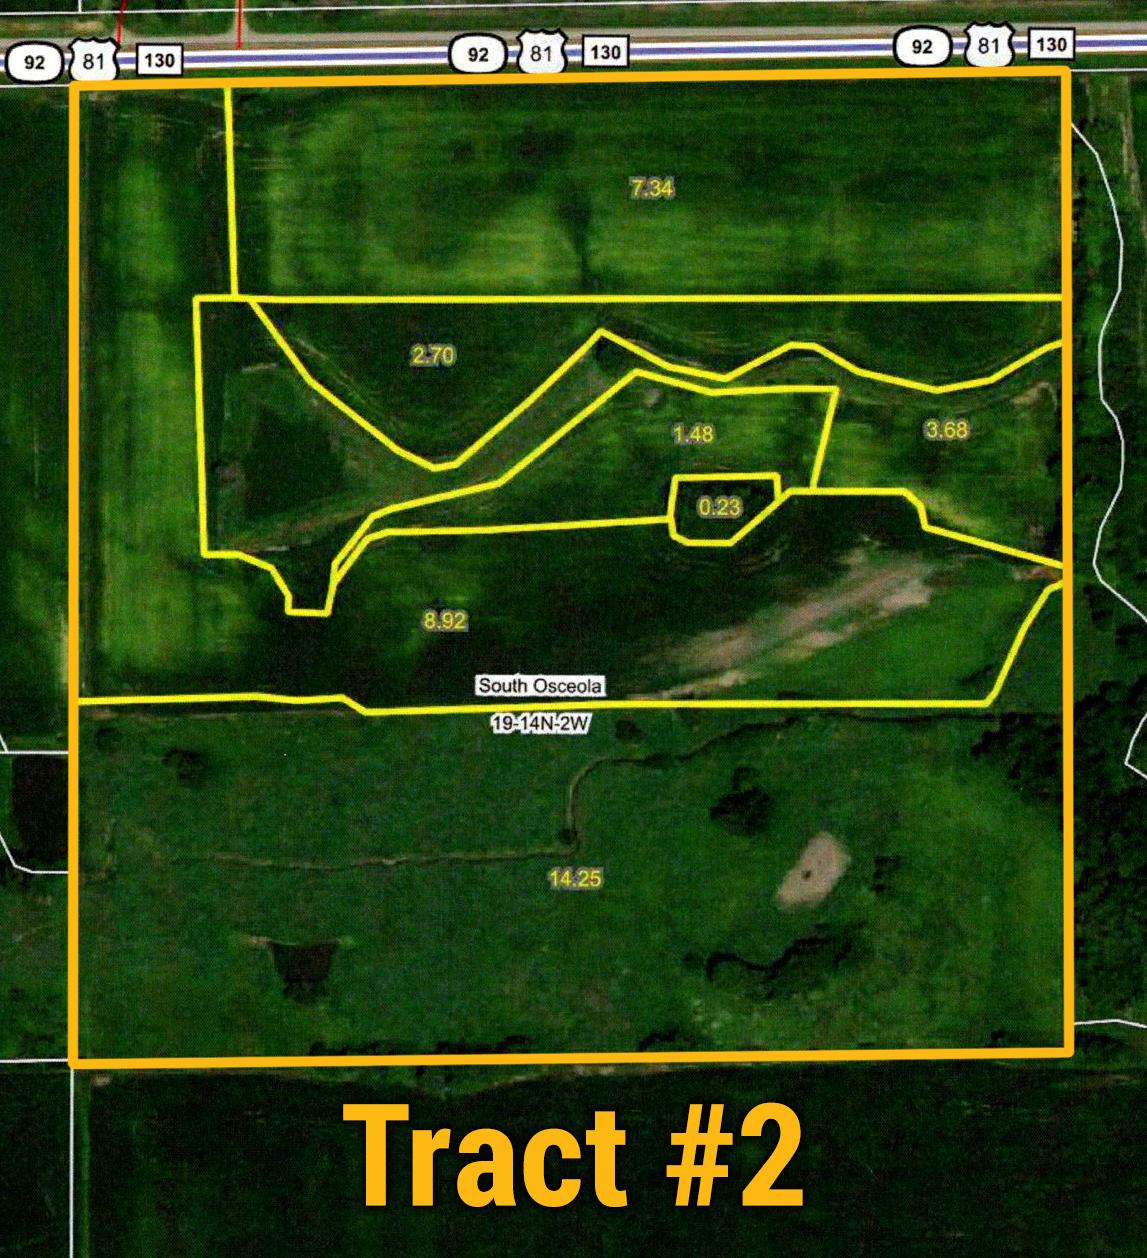 2 Aerial Map_BIR-2152